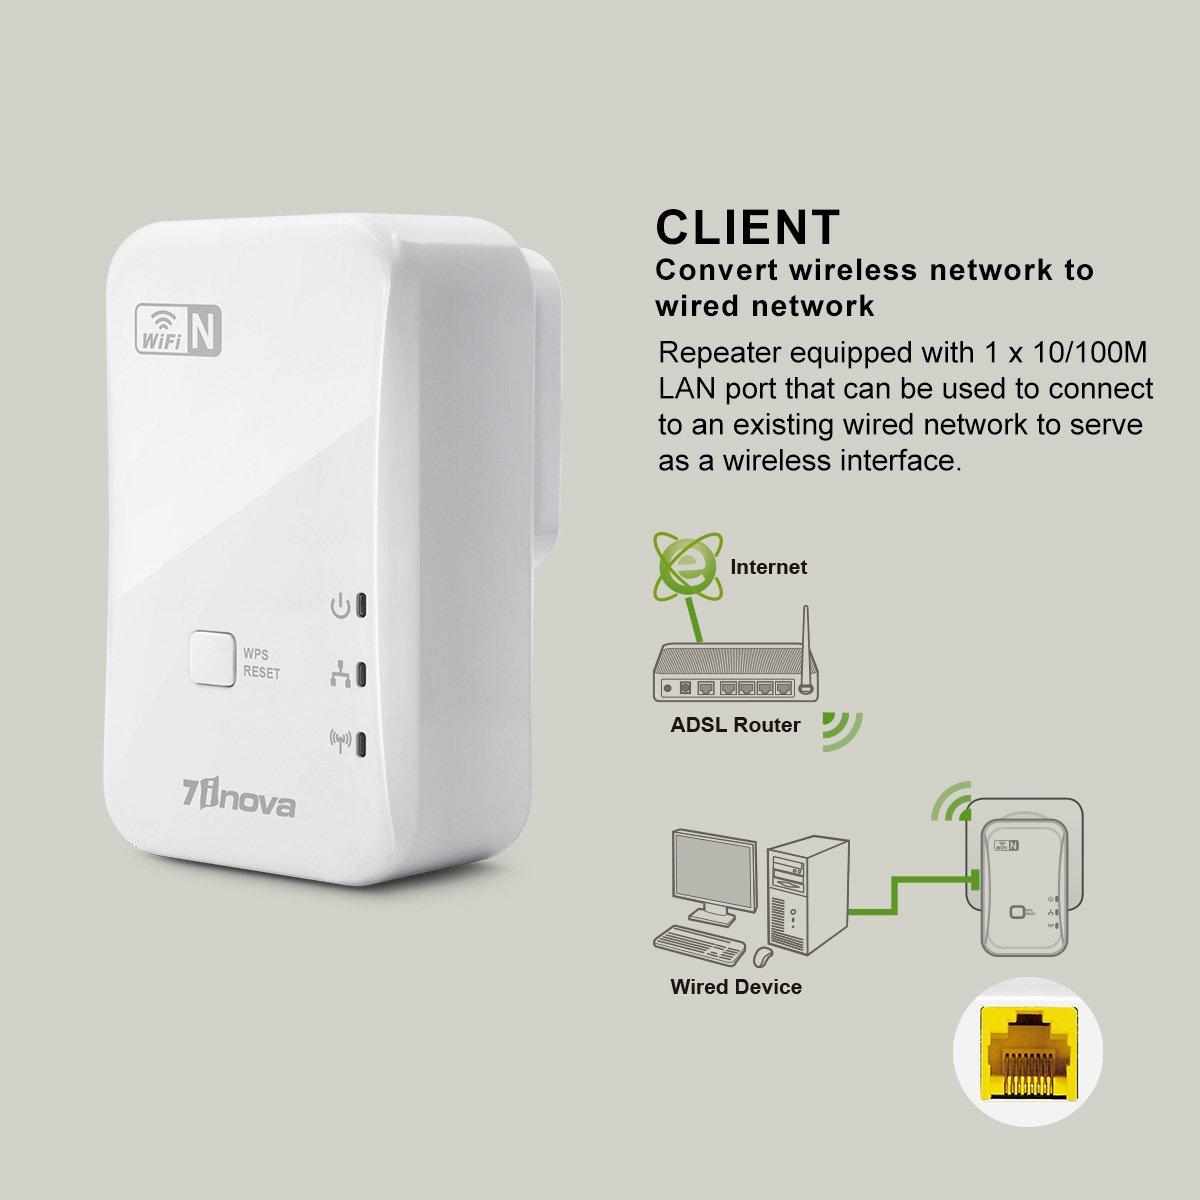 7inova N300 WiFi Range Extender/Repeater: Amazon.co.uk: Electronics